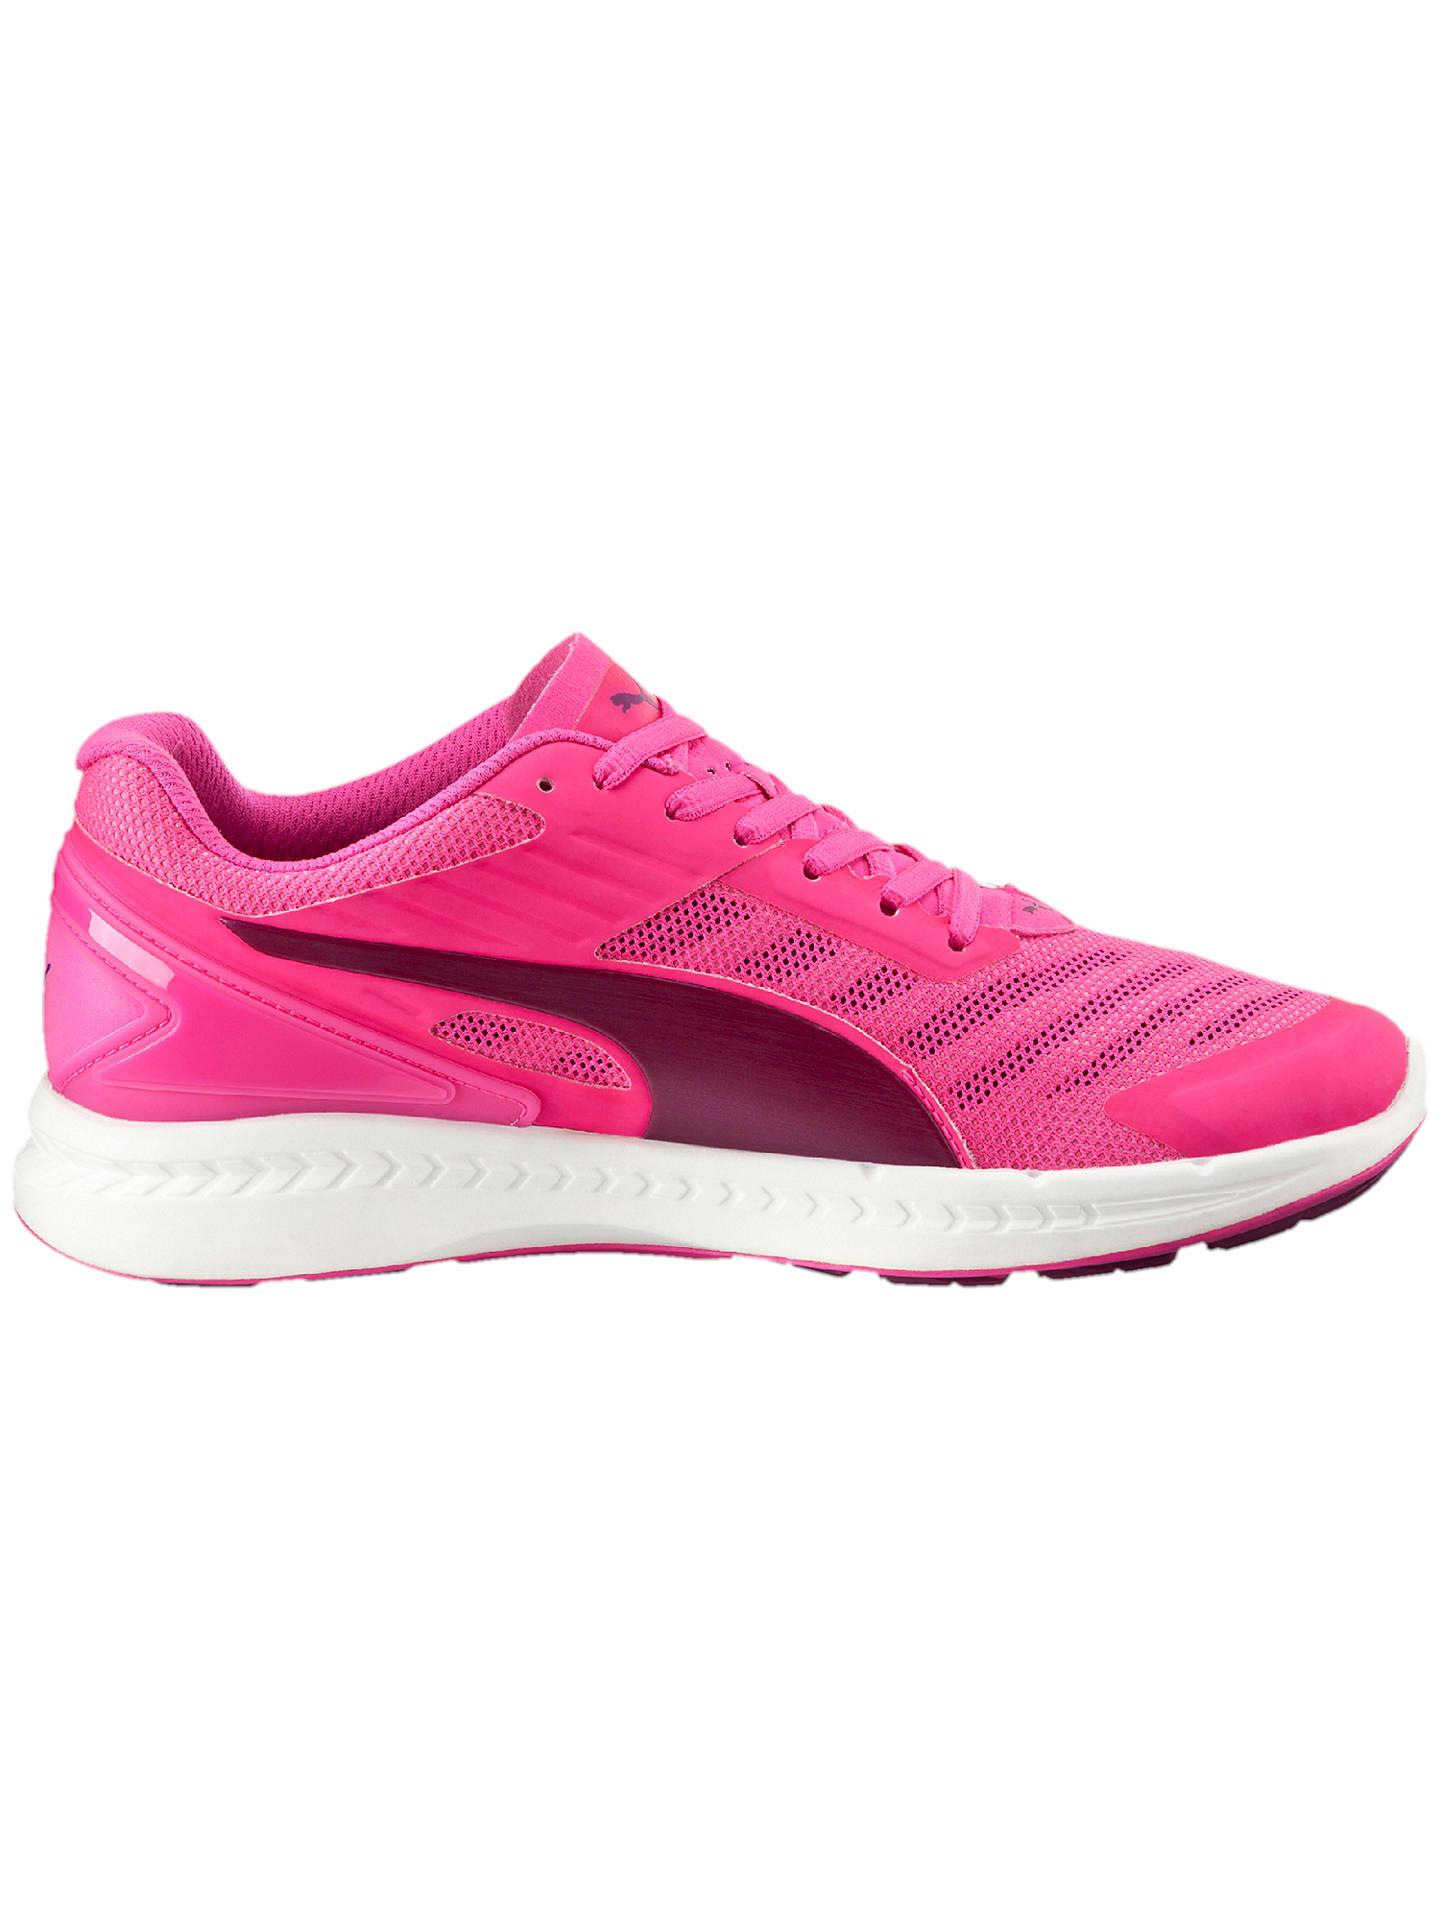 Conception innovante 35c28 4ad98 Puma Ignite V2 Women's Running Shoes, Purple/Pink at John ...